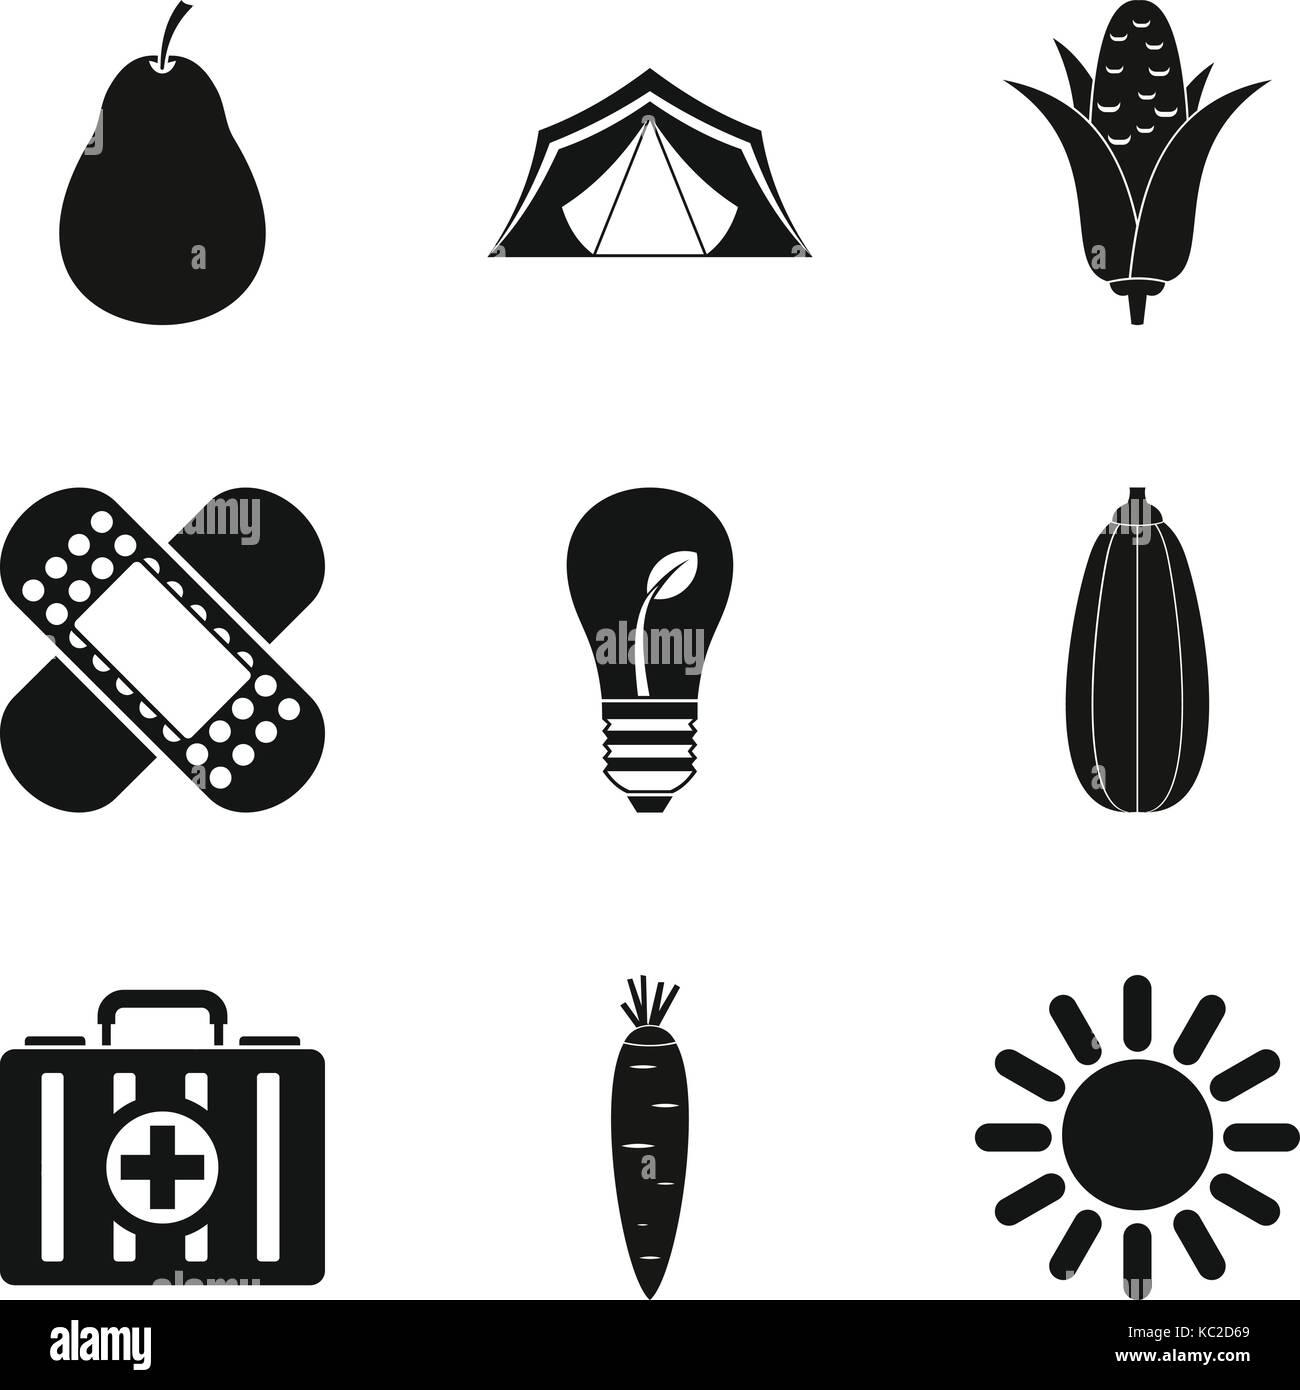 Sanitation icons set, simple style - Stock Image